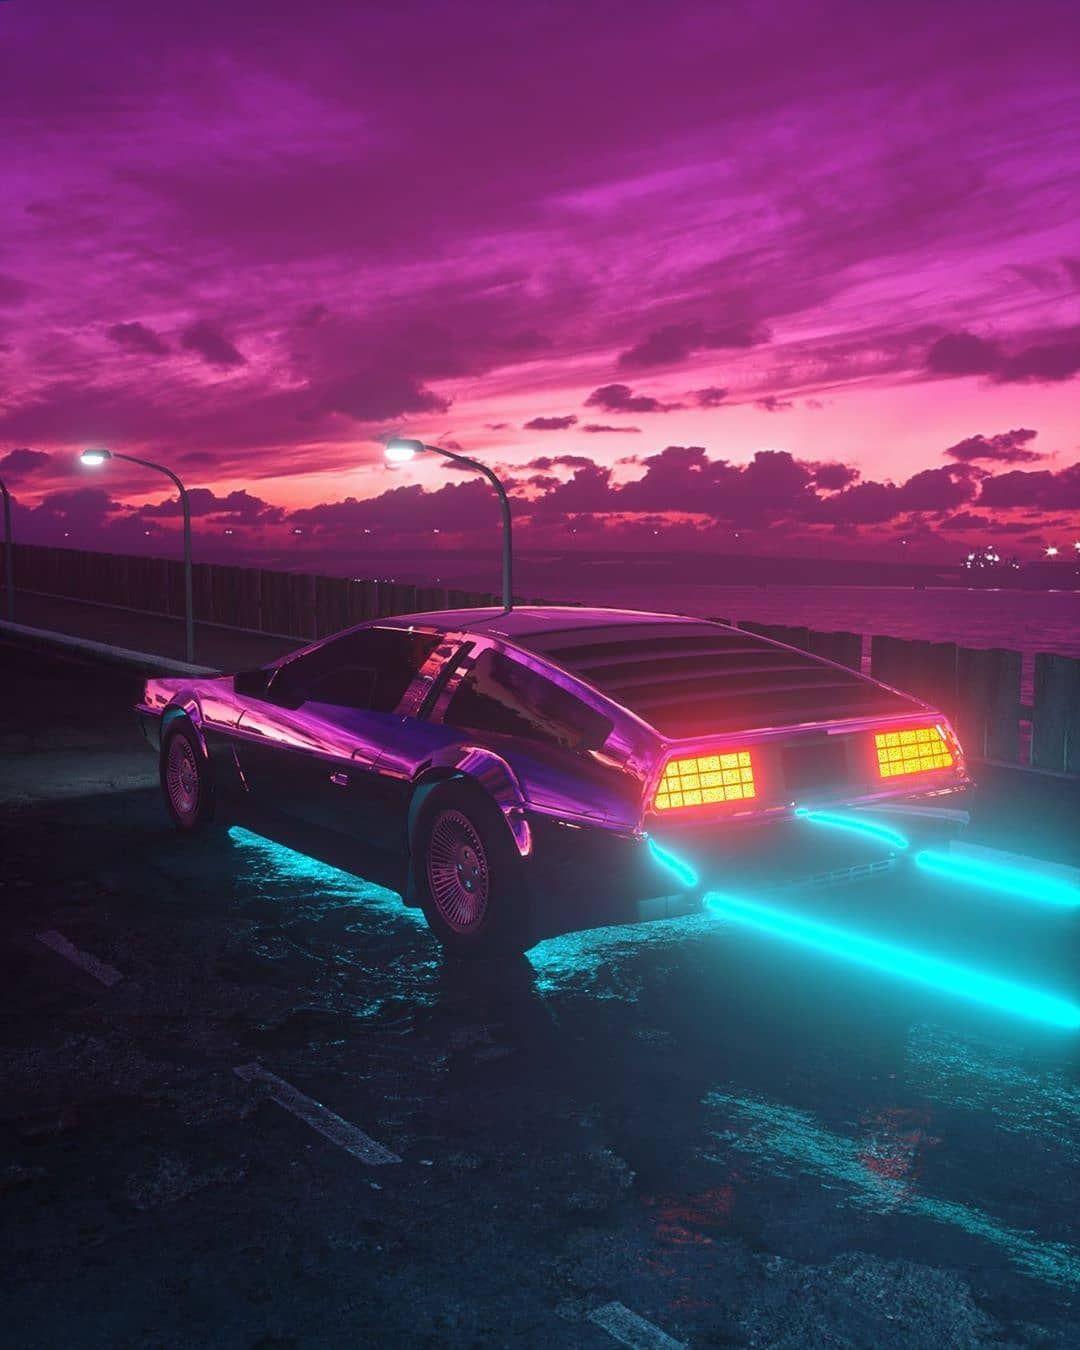 D R E A M R I D E R Gufe Visuals Synthwave 80s Retro Newretrowave 1980s Vintage Newwave Eighties Neon Vaporwave Neon Wallpaper Neon Car